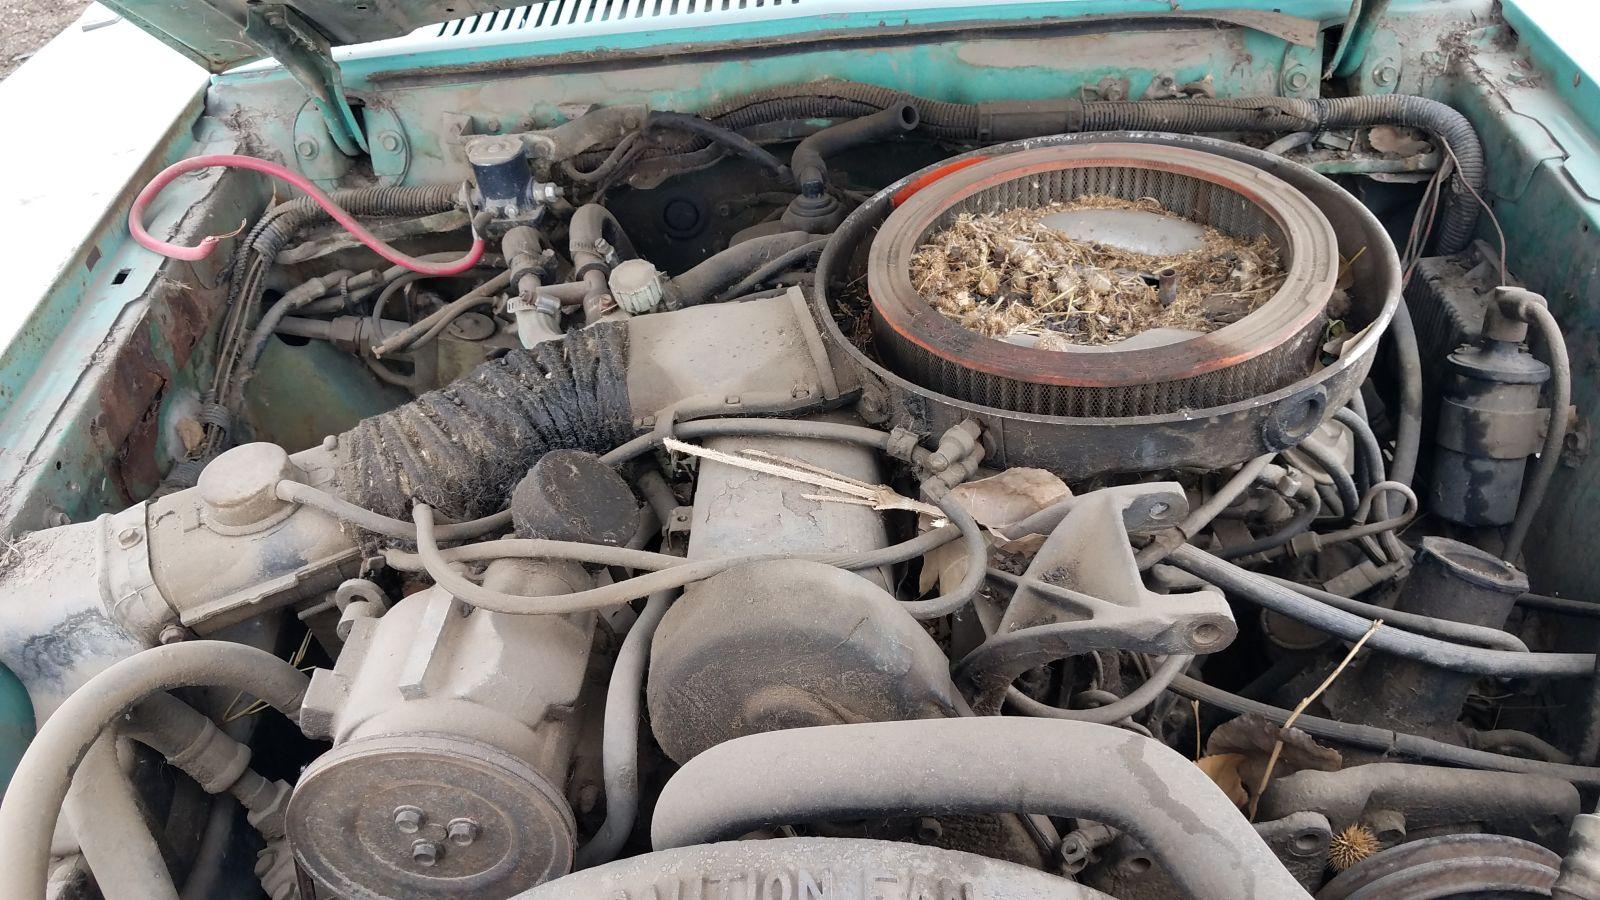 Junkyard Gem: 1977 Mercury Bobcat | Autoblog